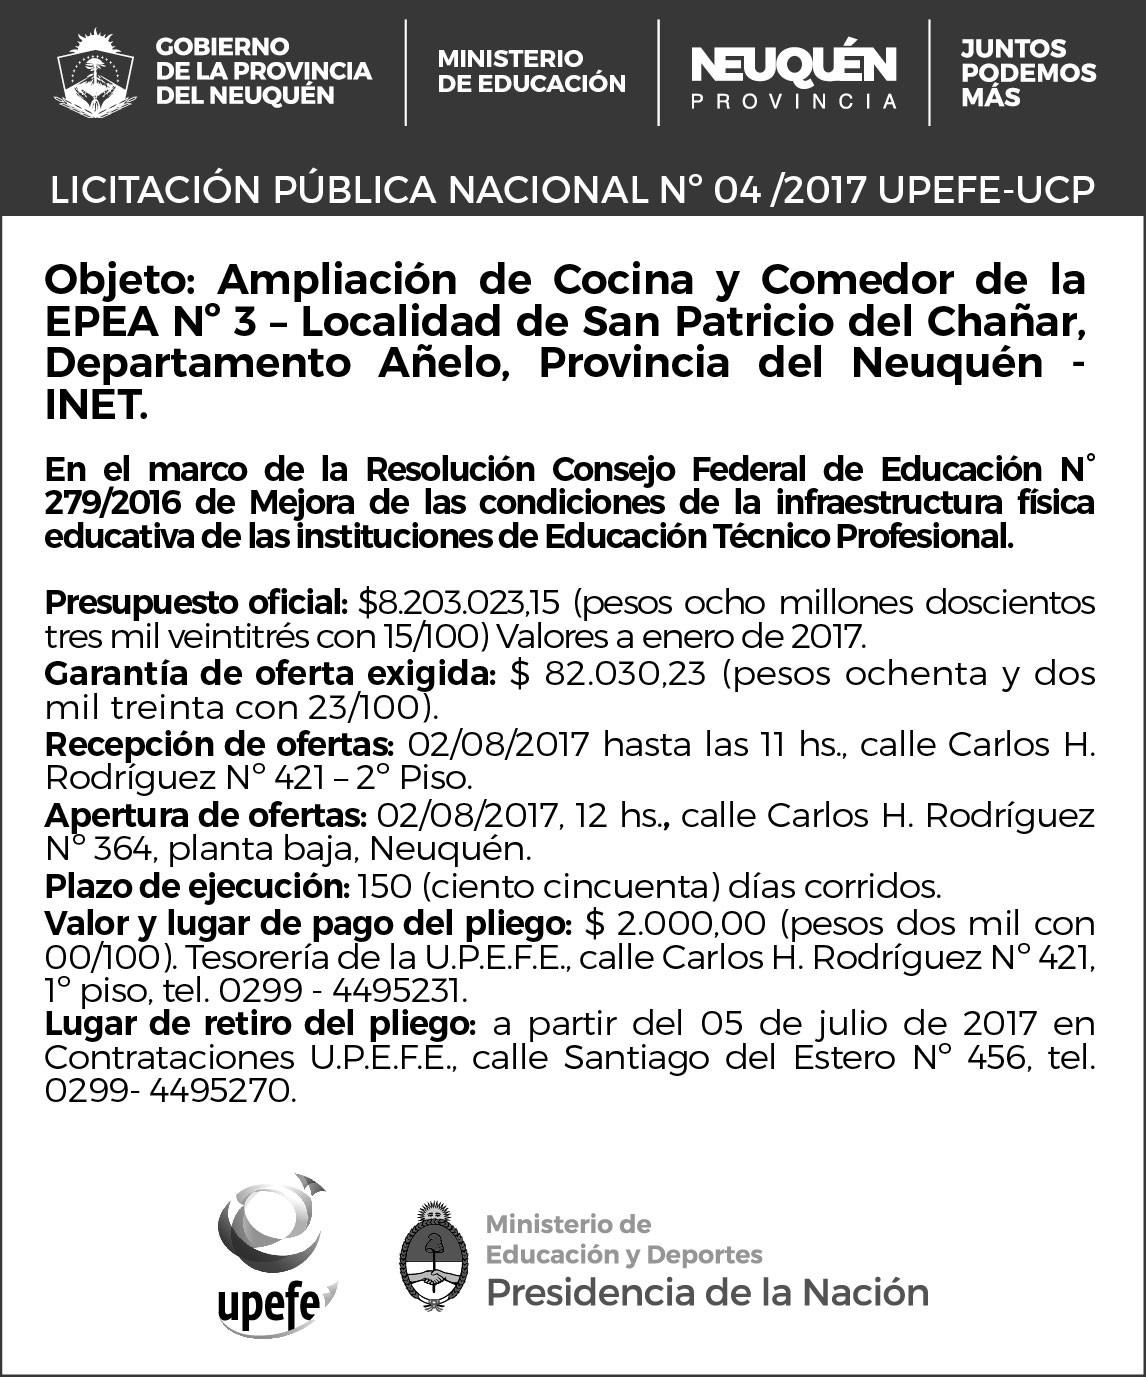 LPN04-17